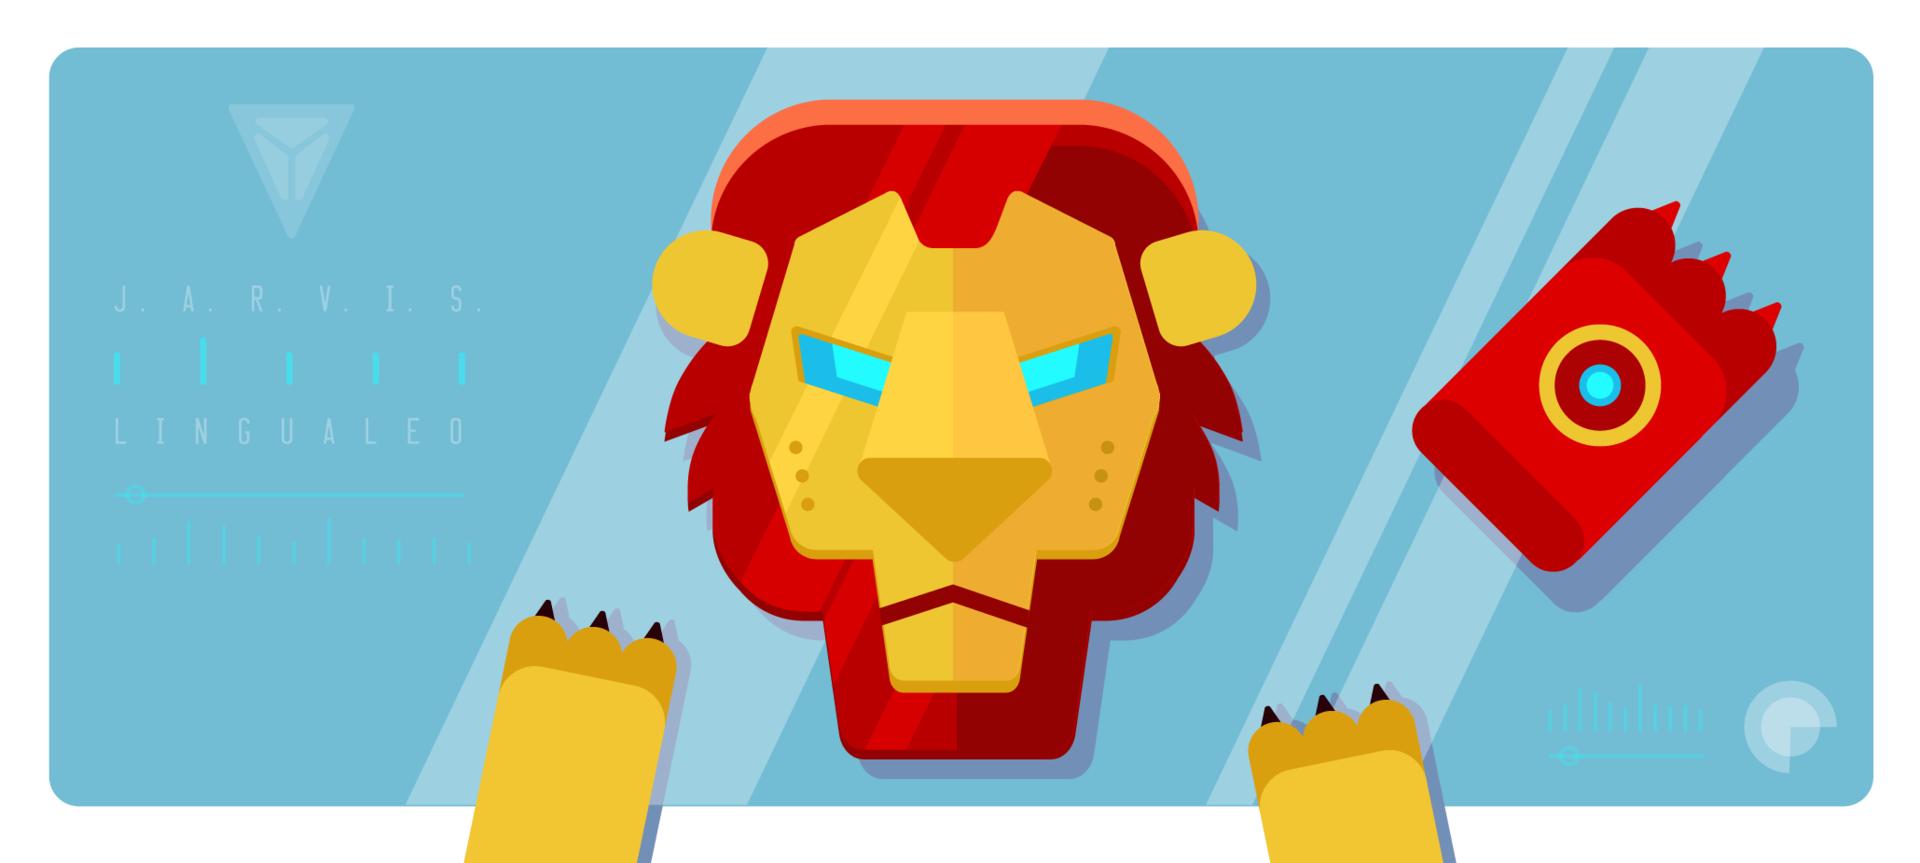 J.A.R.V.I.S. — невидимый помощник Leo